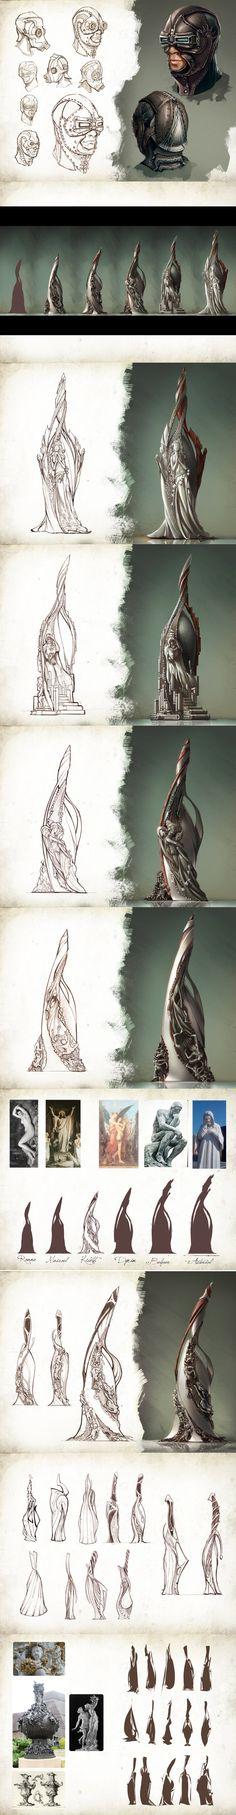 Sabriel work by Falarsimons on deviantART